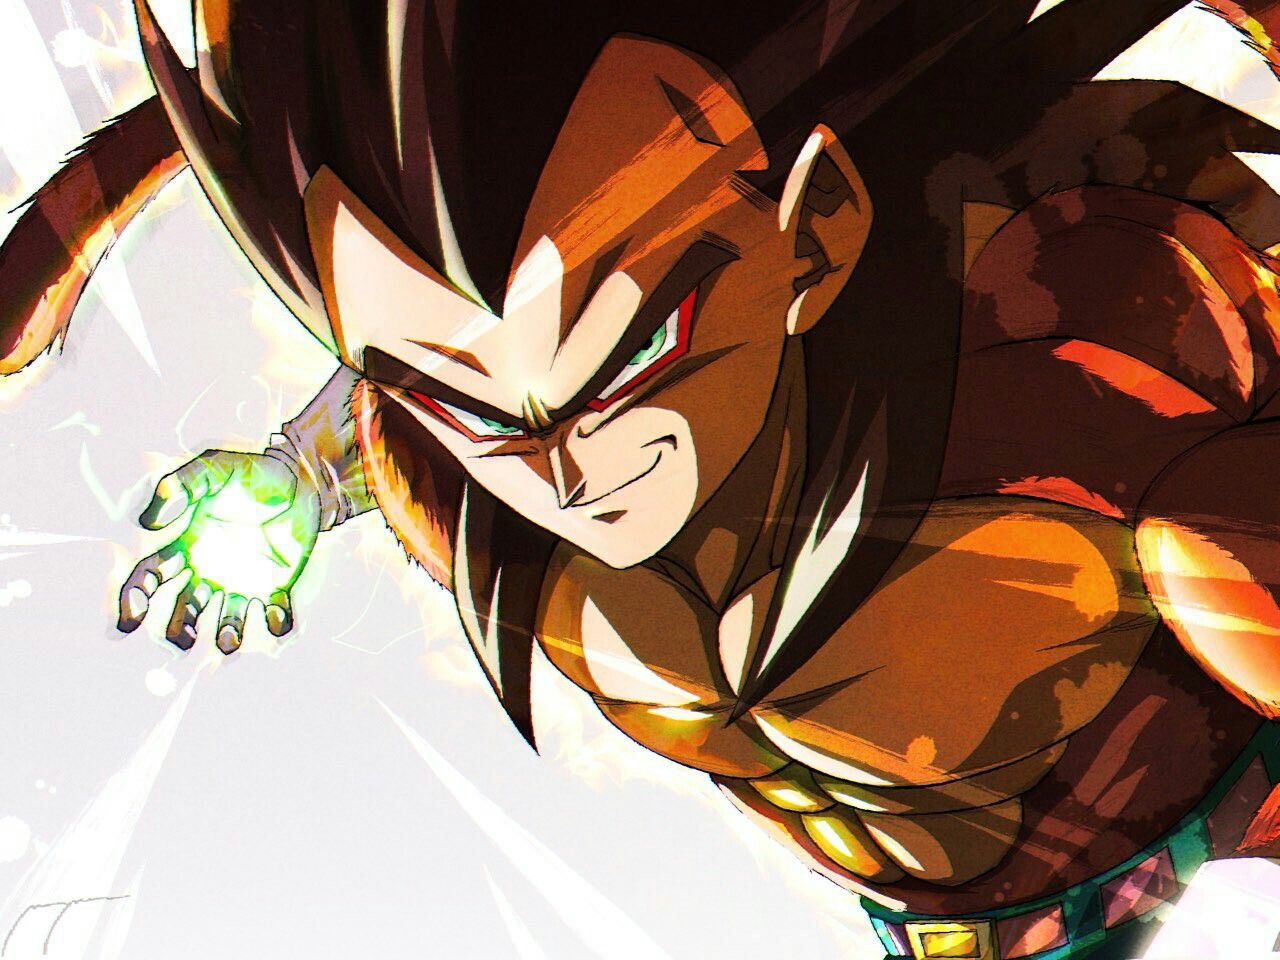 Pin By Sinful On Dragonๅาball In 2020 Anime Dragon Ball Super Dragon Ball Painting Dragon Ball Goku